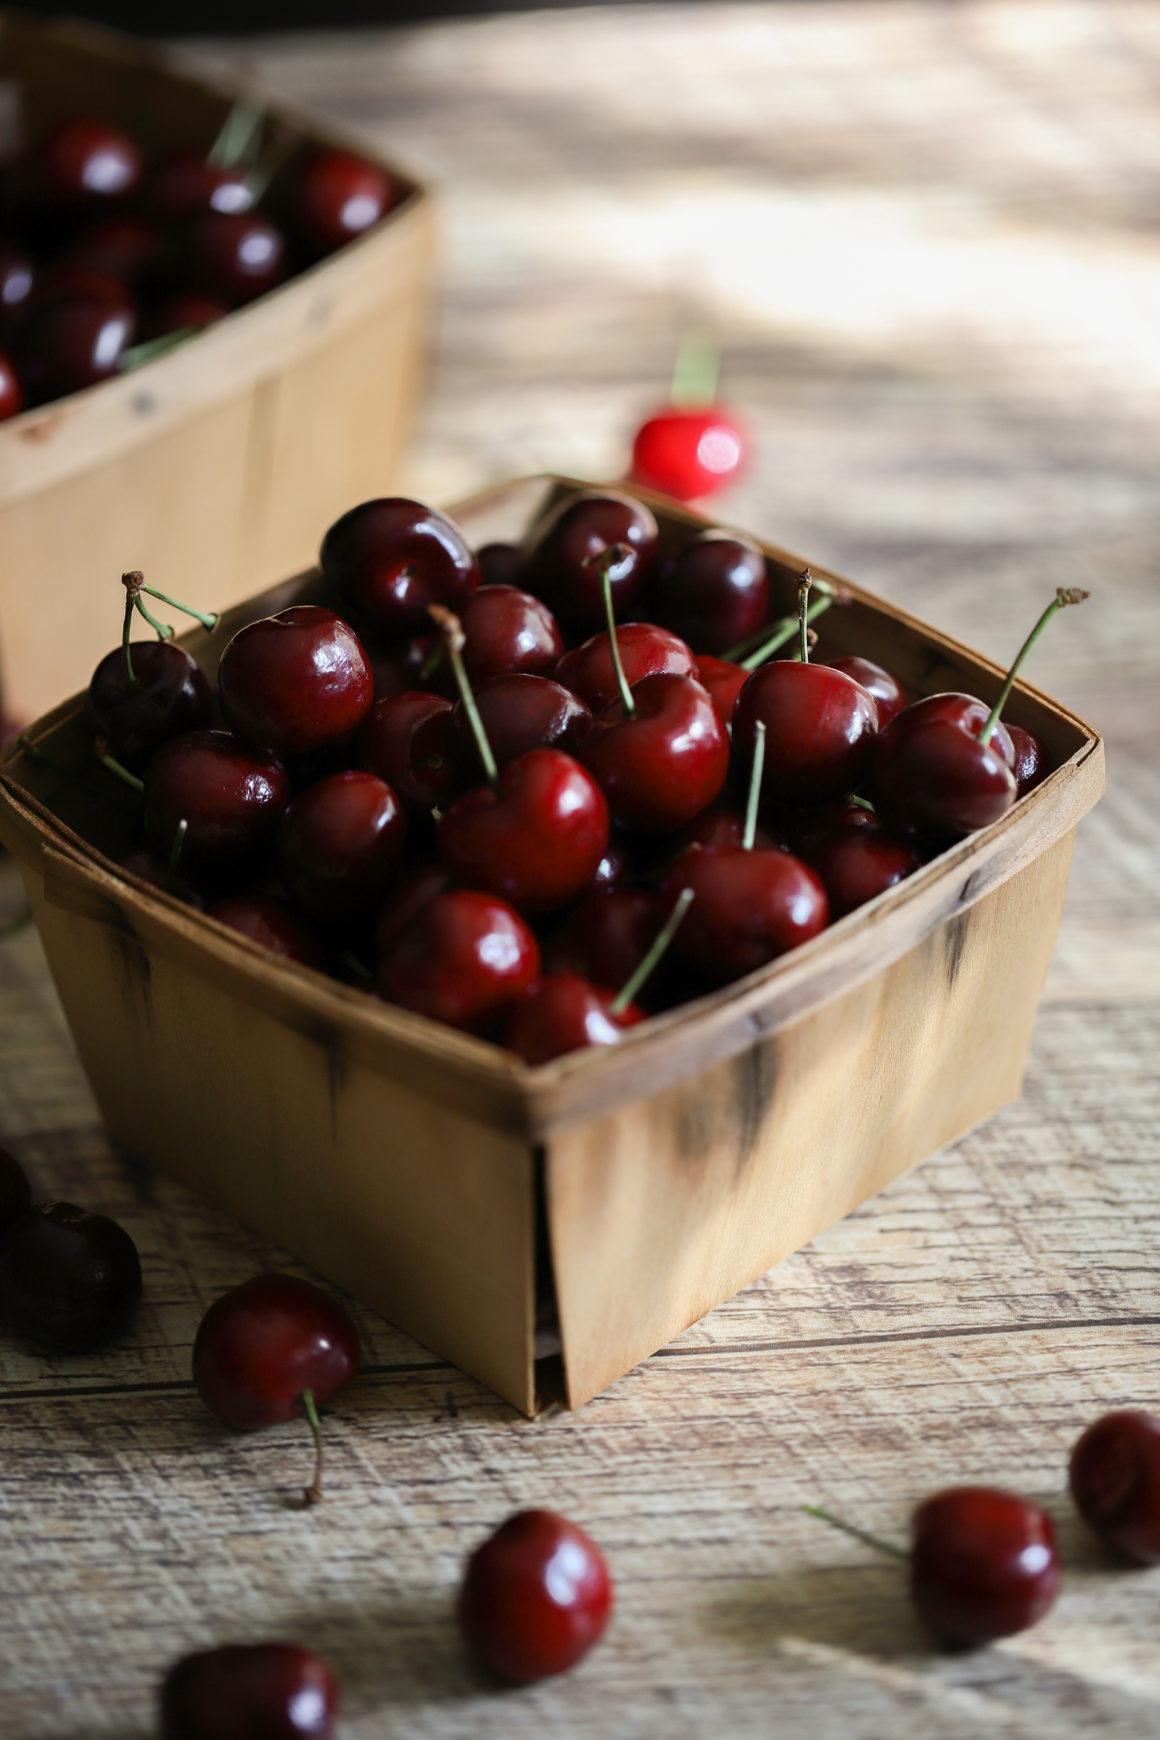 bing cherries in a wooden basket